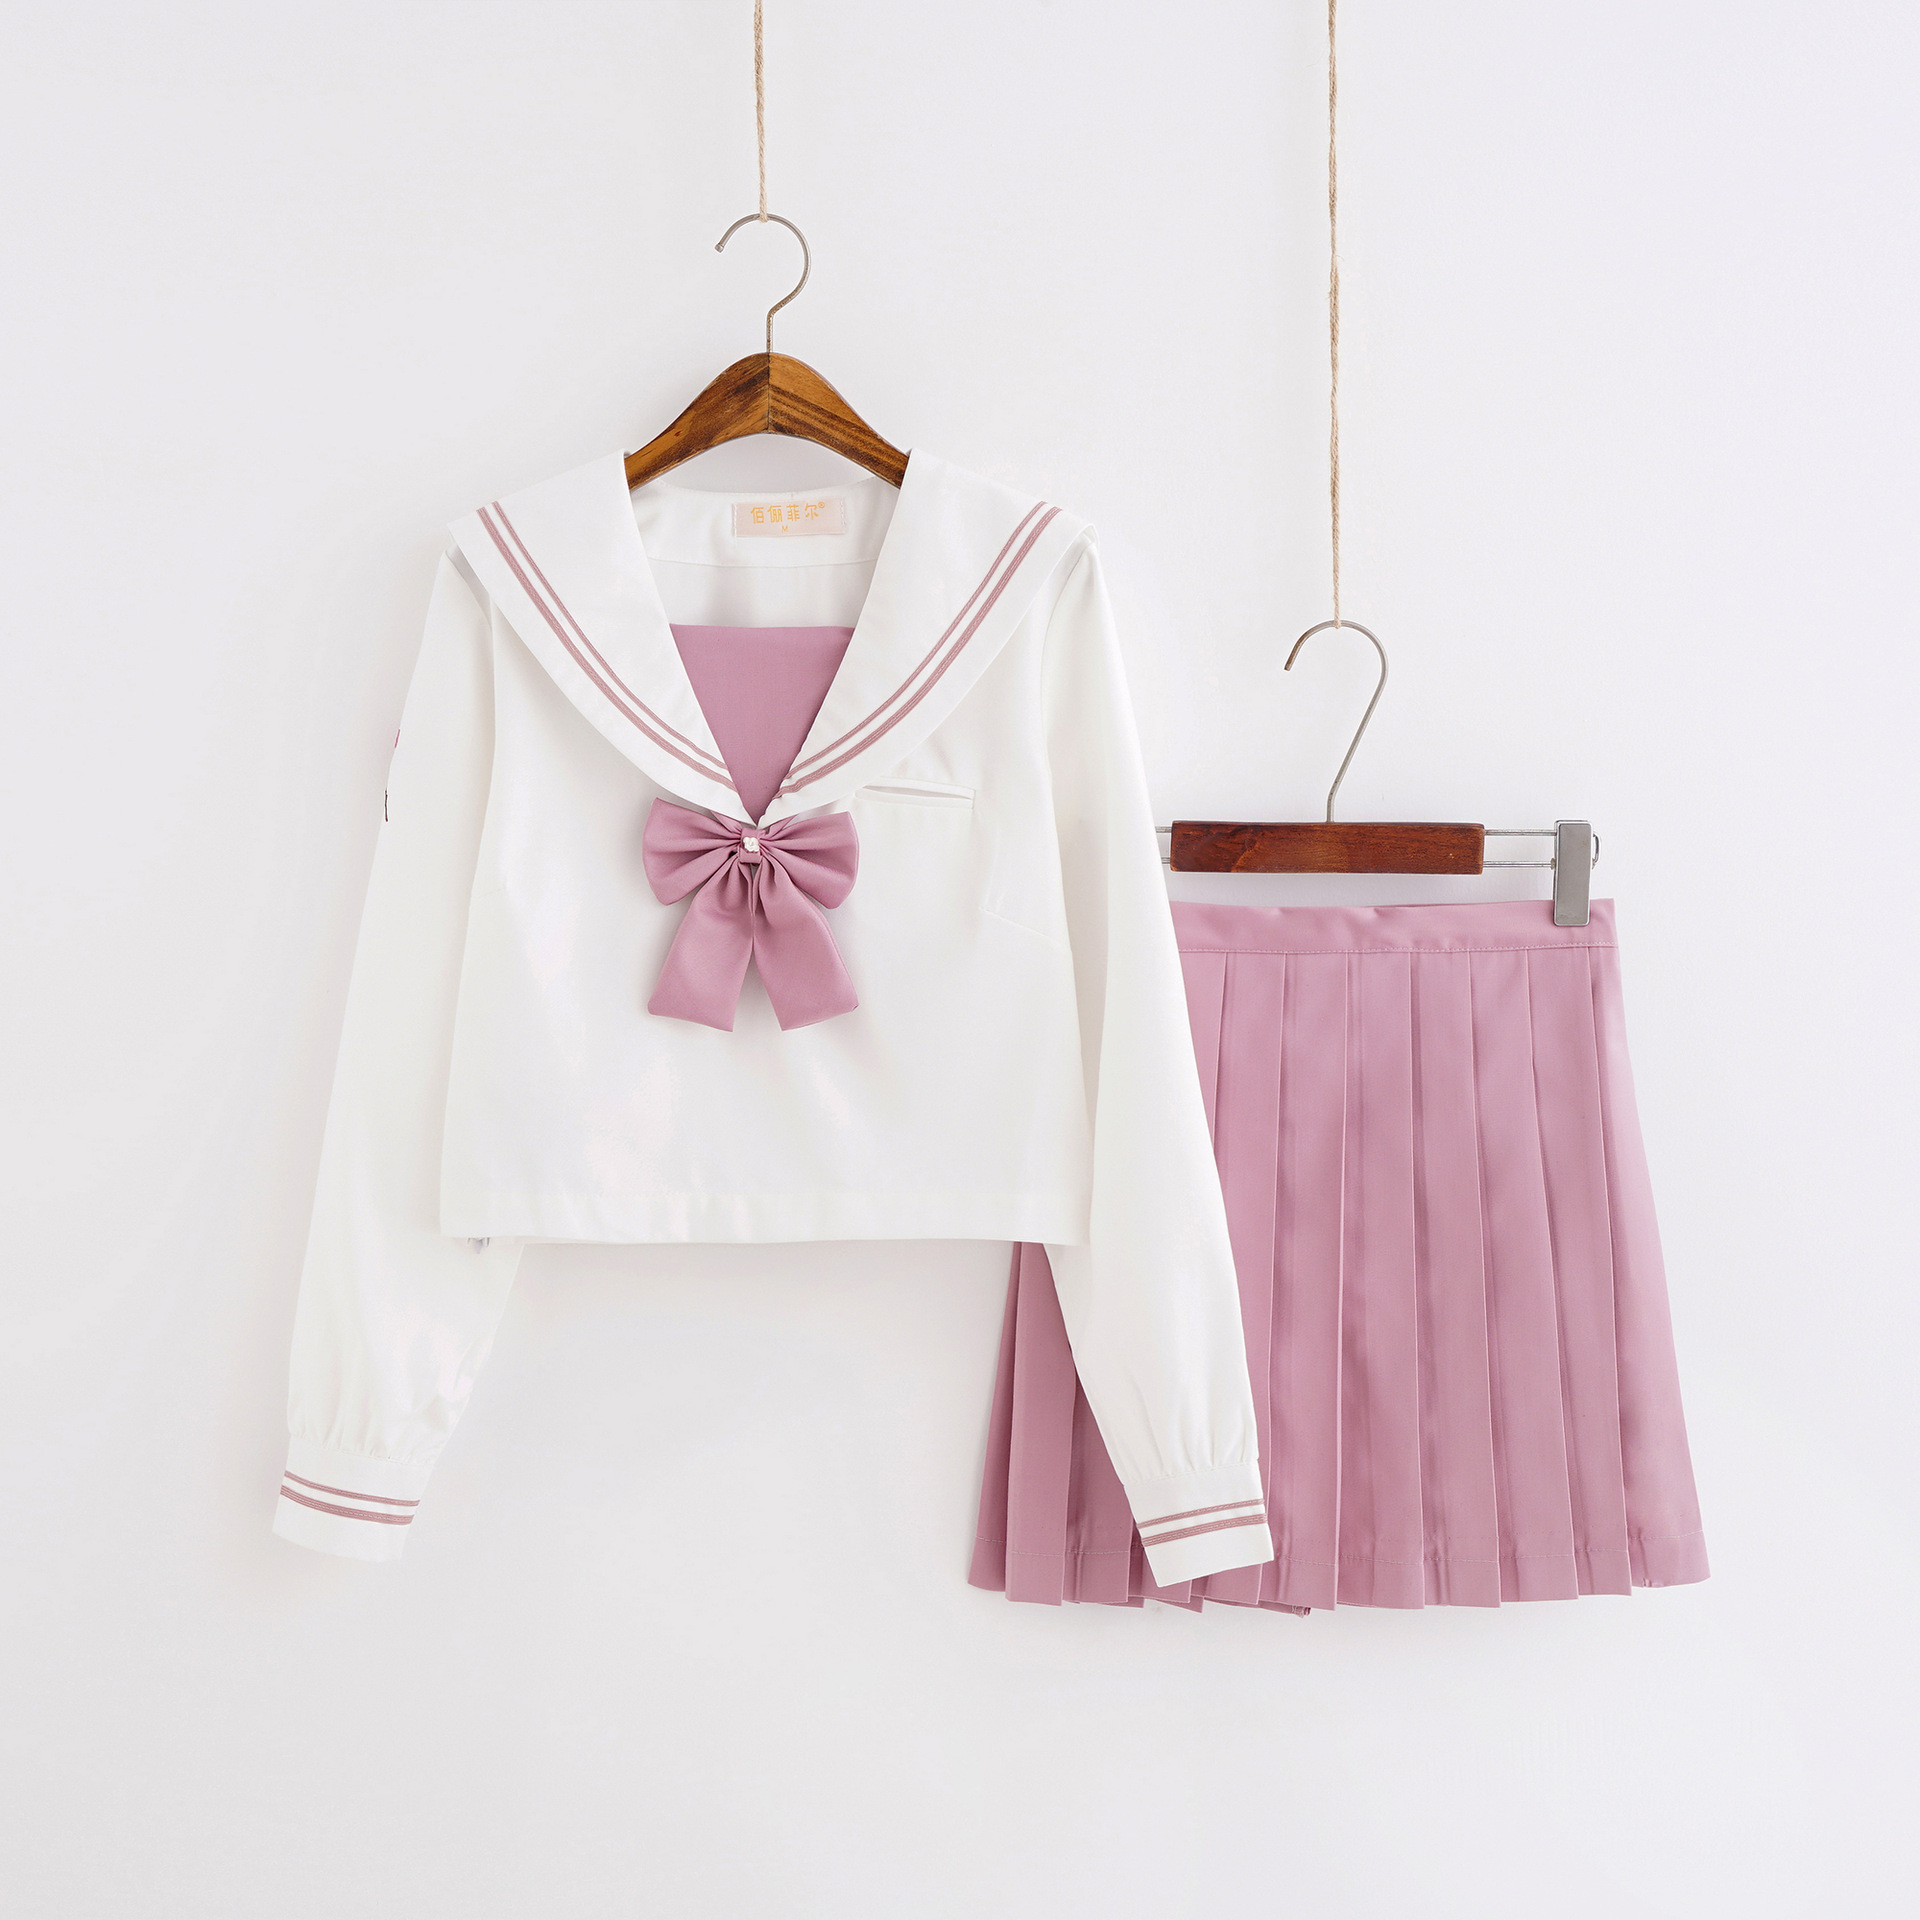 Japanese JK Uniform Pink Magnolia Embroidery Sailor Suit Student College School Uniform Long Sleeve Suit Women Pleated Skirt